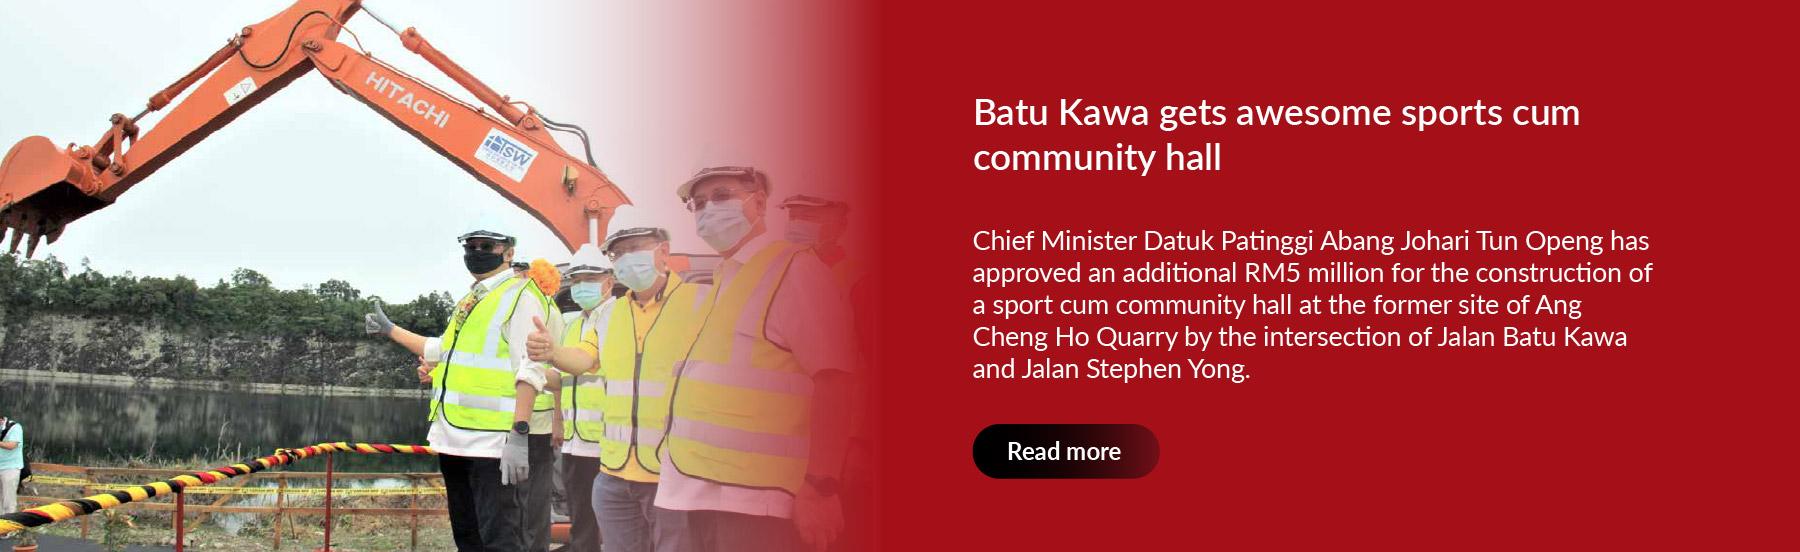 Batu Kawa gets awesome sports cum community hall